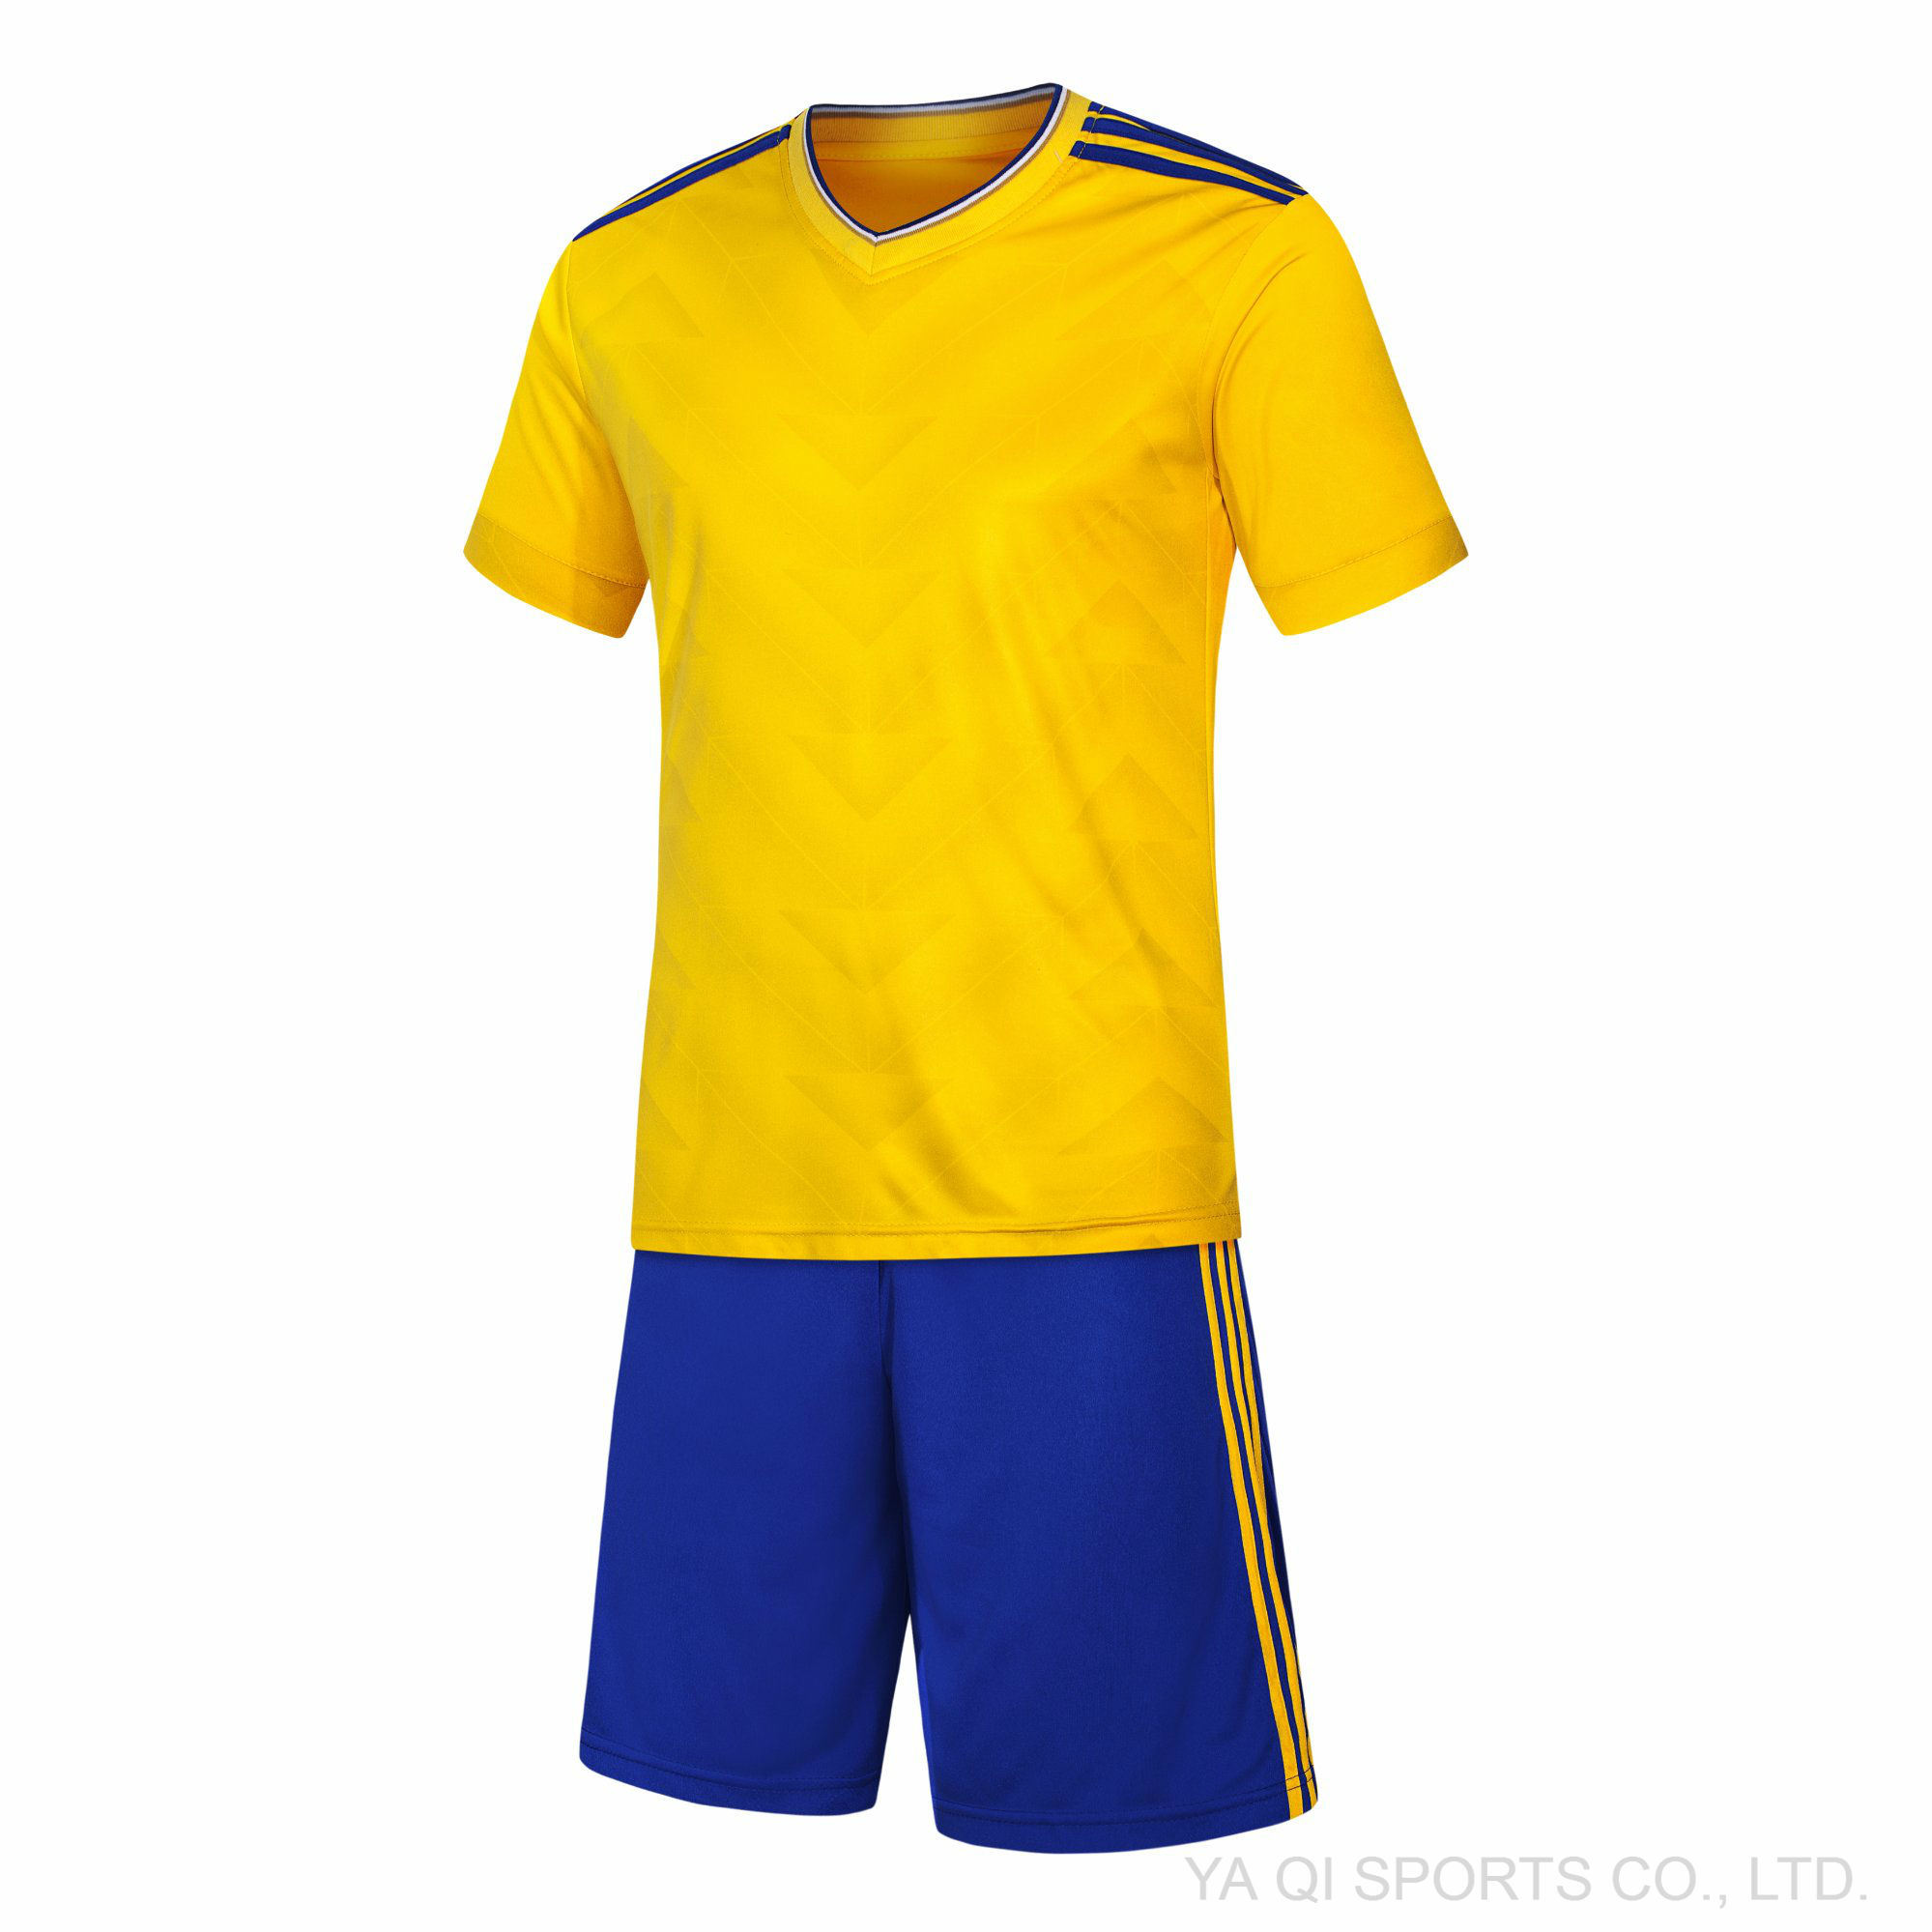 d97236de5 Top Customize Training Soccer Jersey Kits Hot Club Thailand Quality Training  Football Jersey